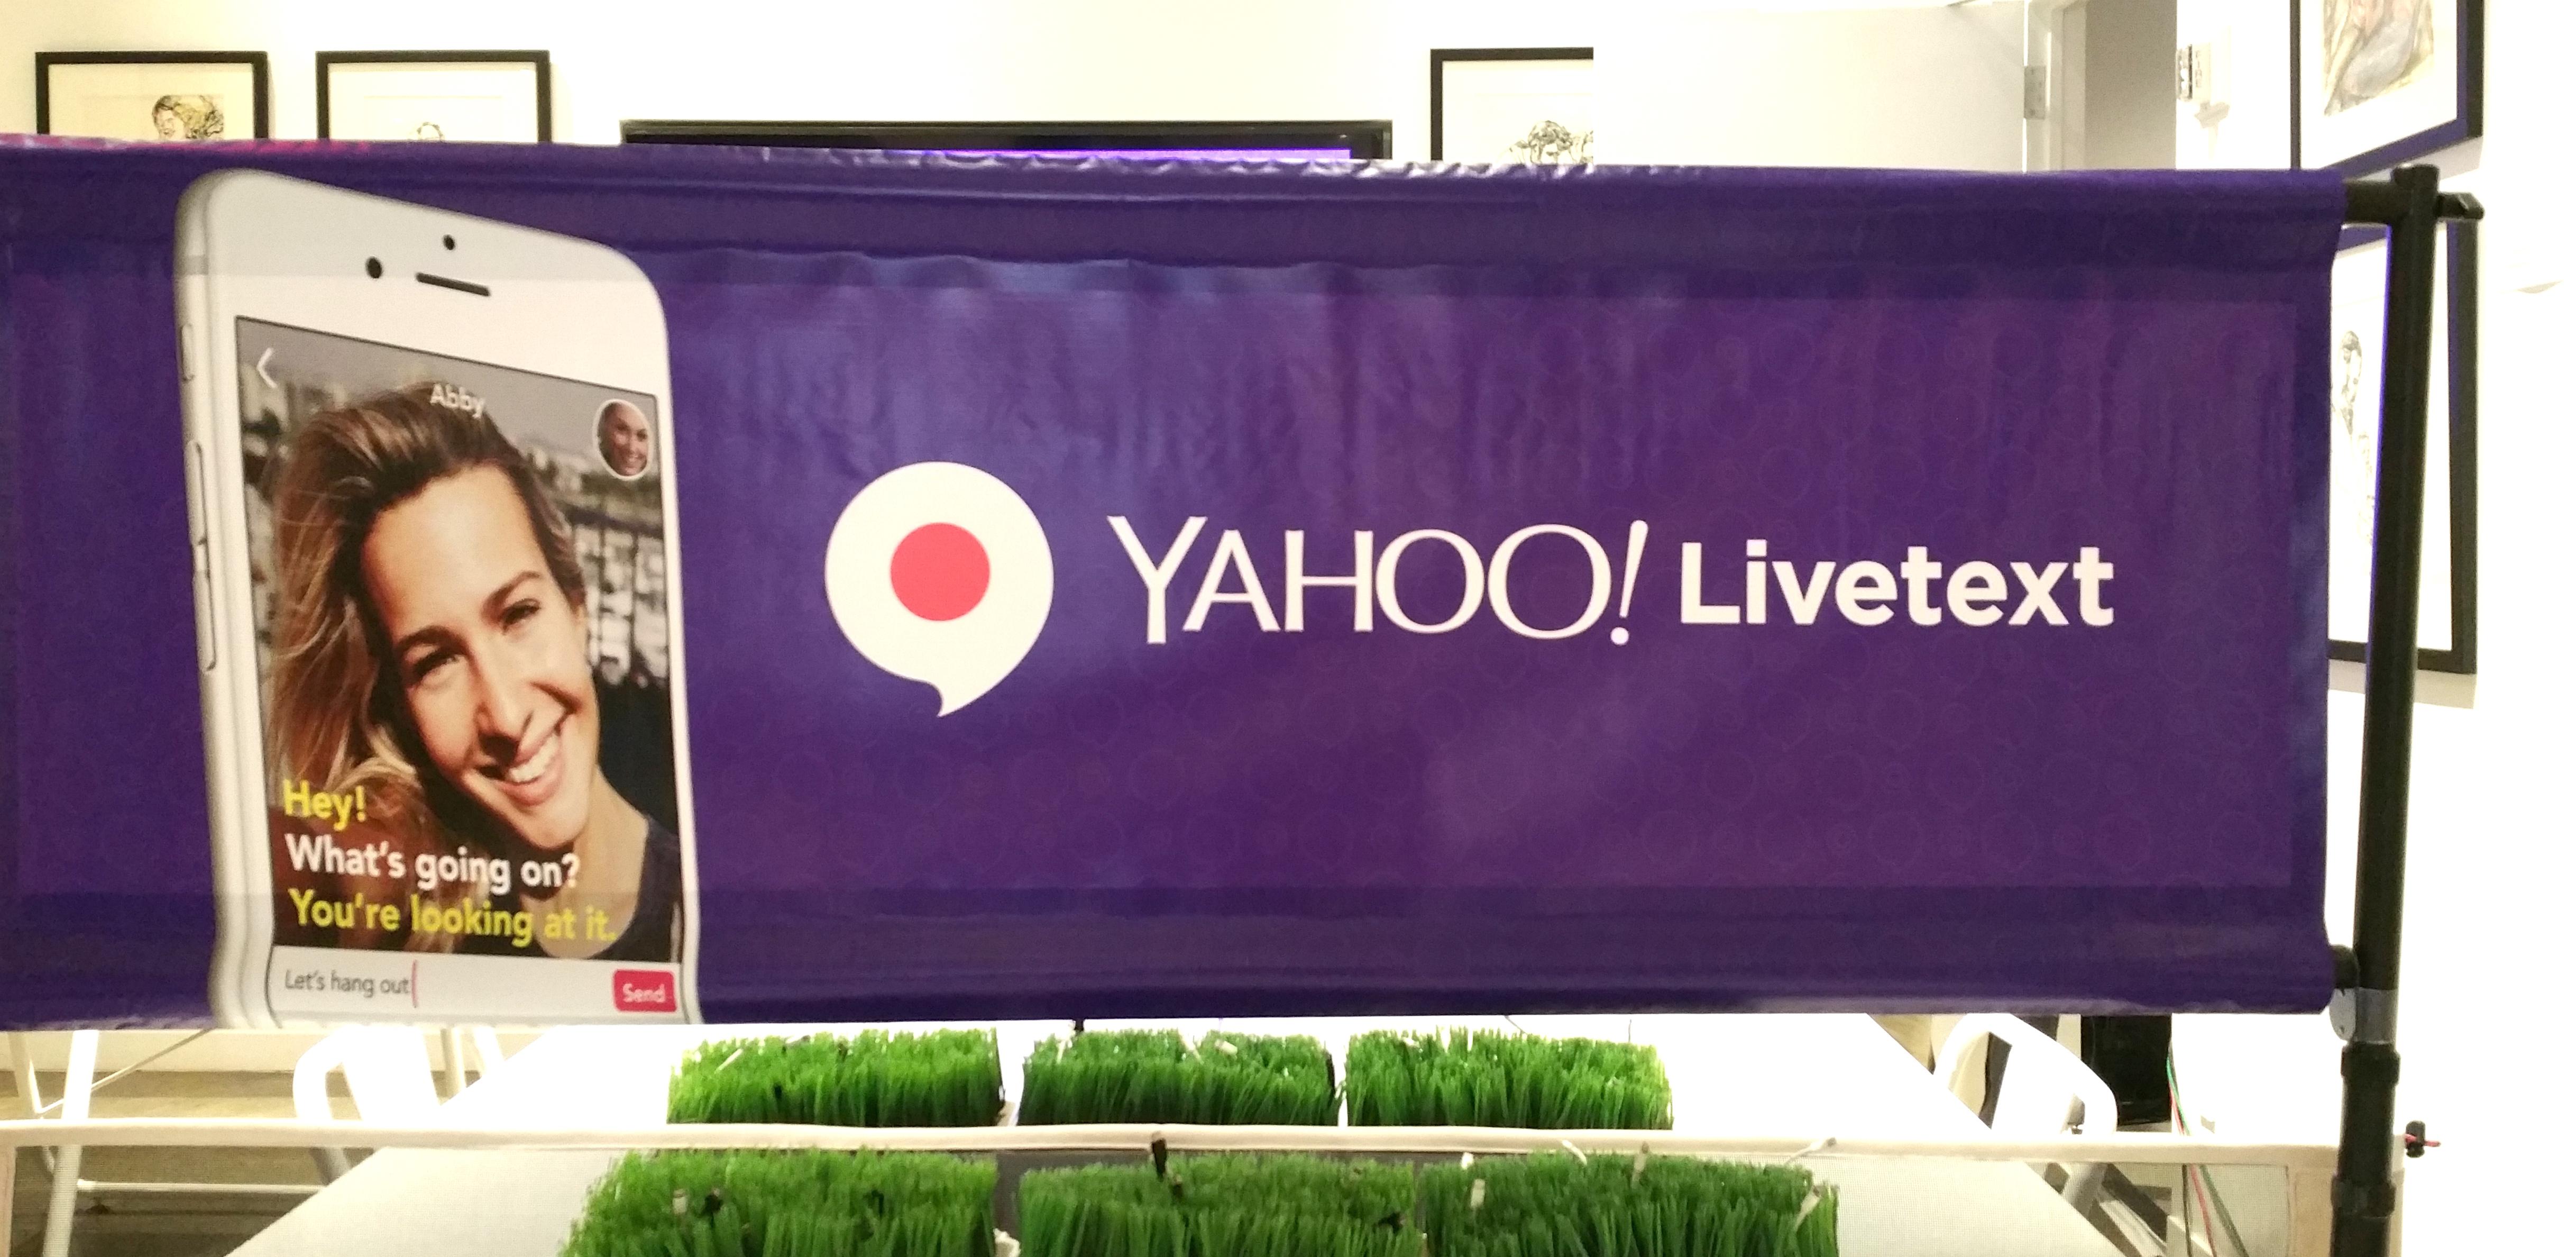 Yahoo Us Url Yahoo Livetext